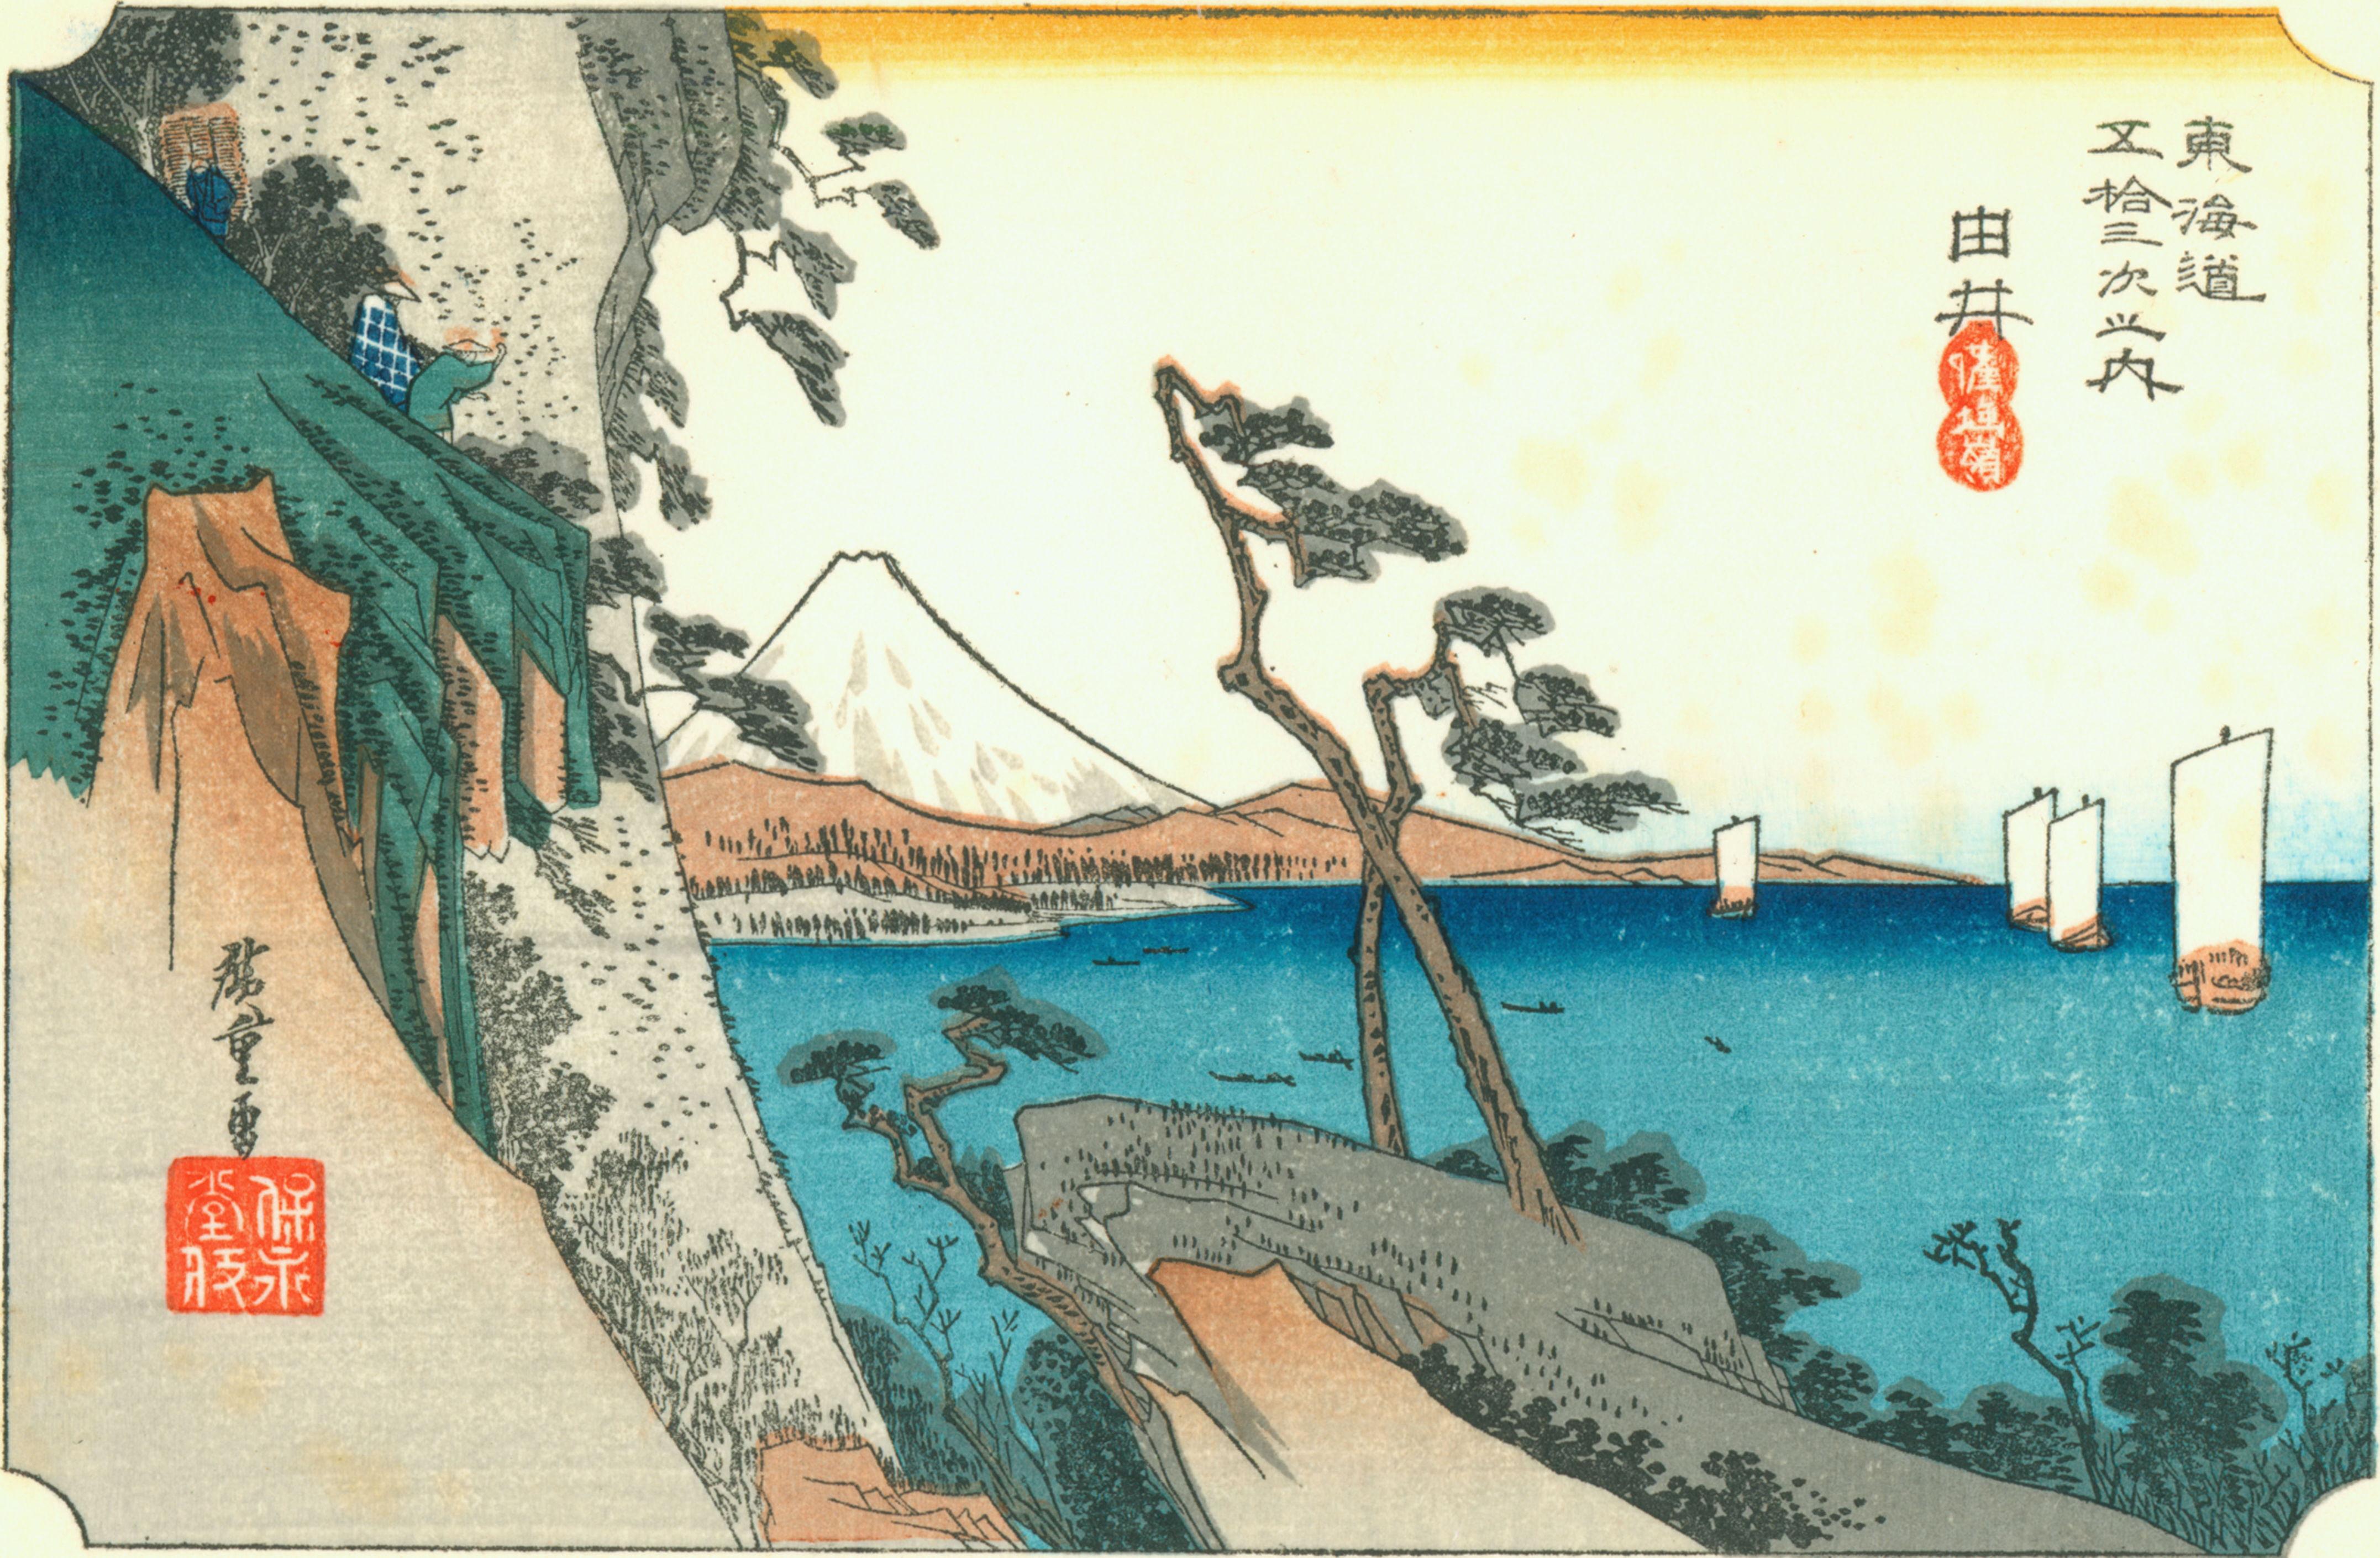 File:Hiroshige17 yui.jpg - Wikimedia Commons